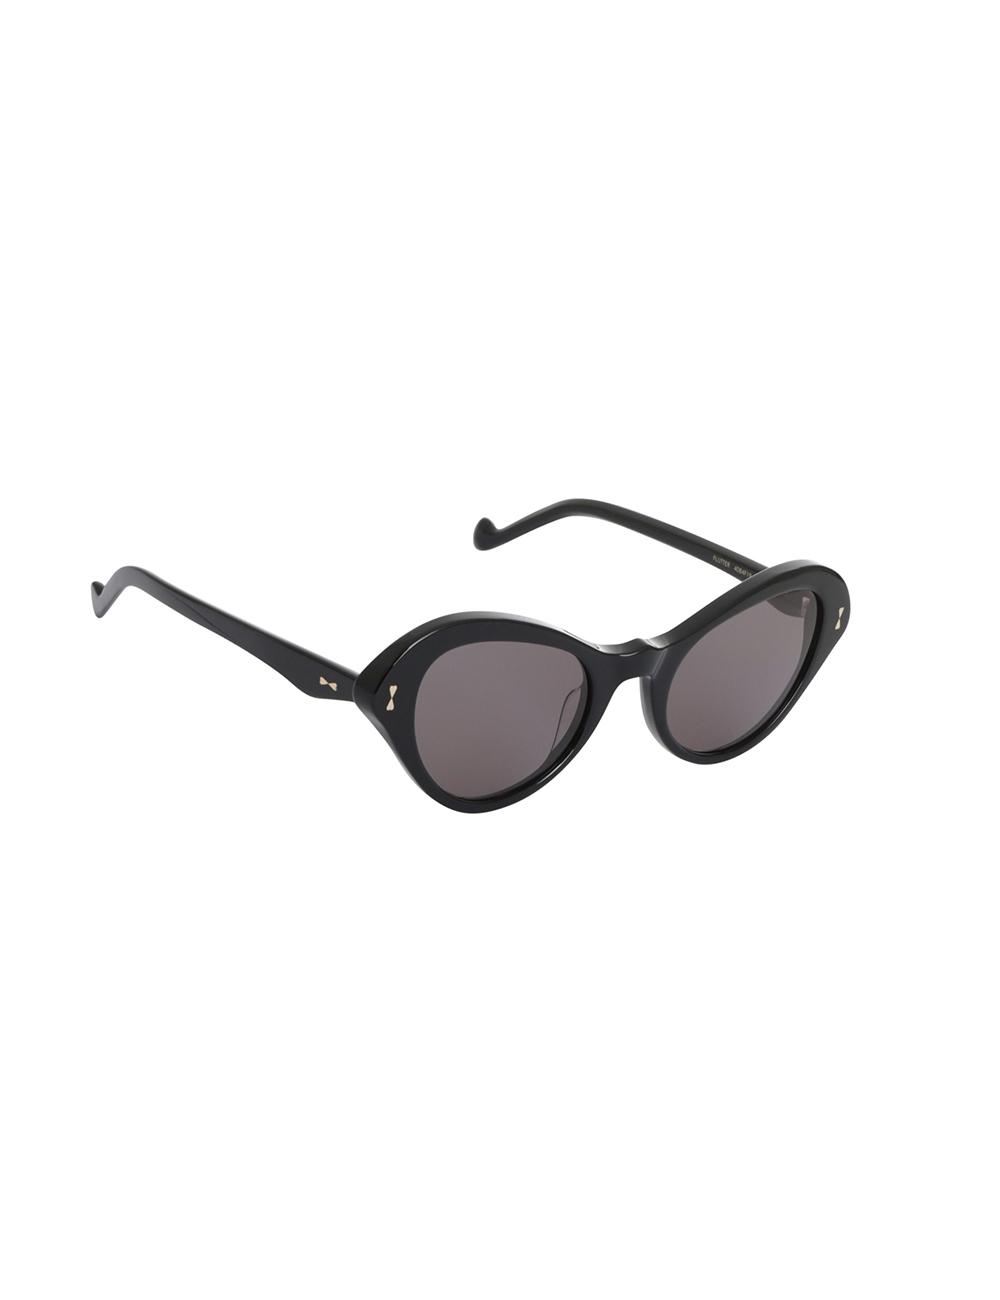 Flutter Oval Sunglasses